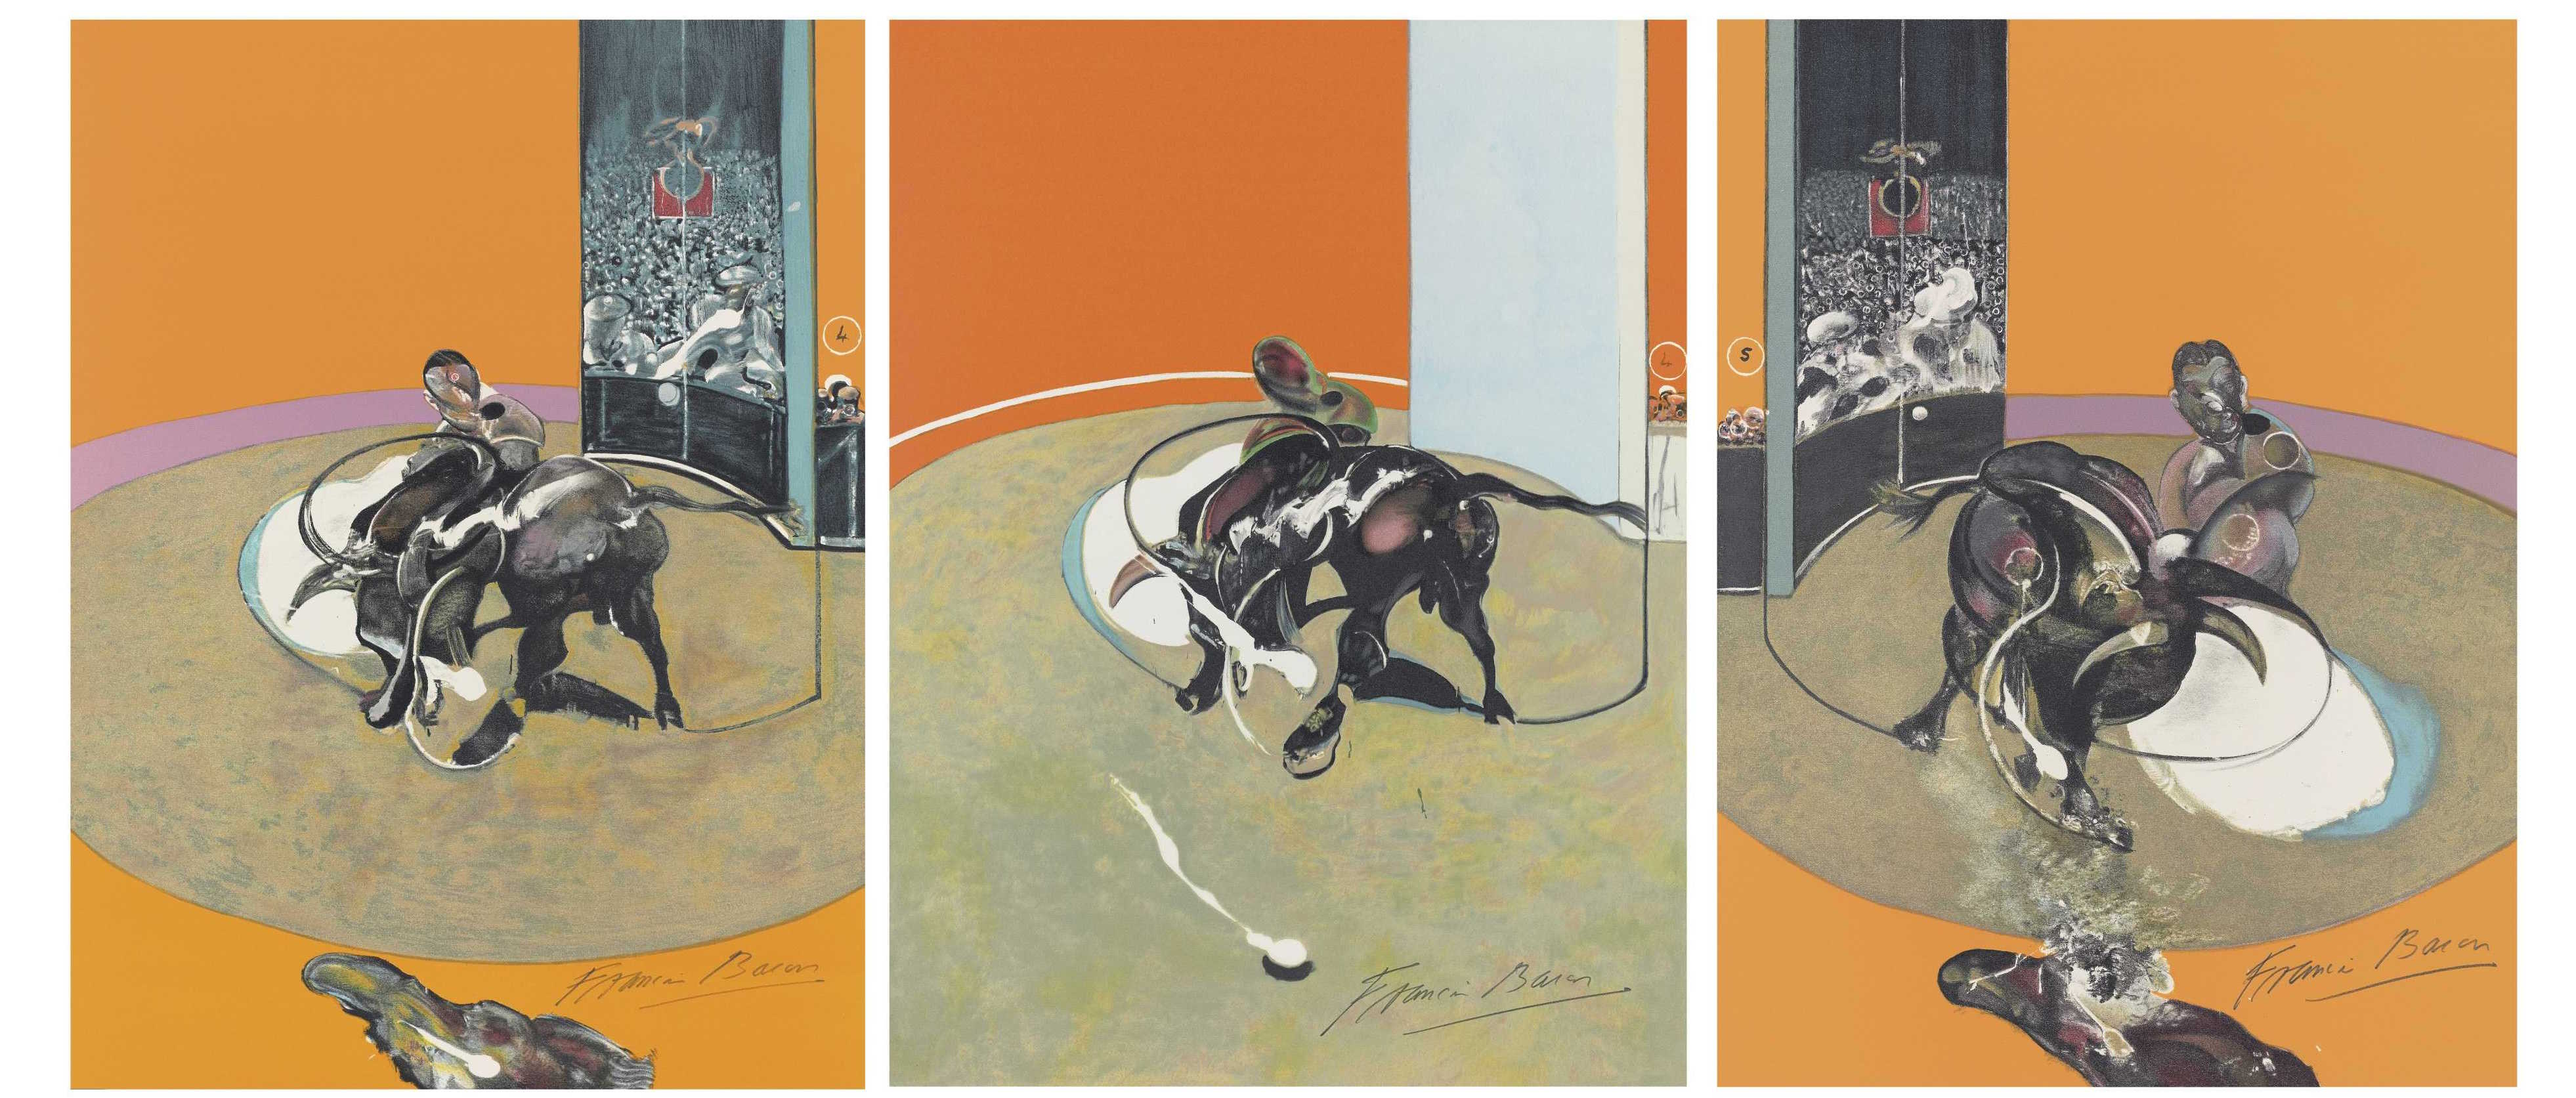 Mirroir de la Tauromachie by Francis Bacon